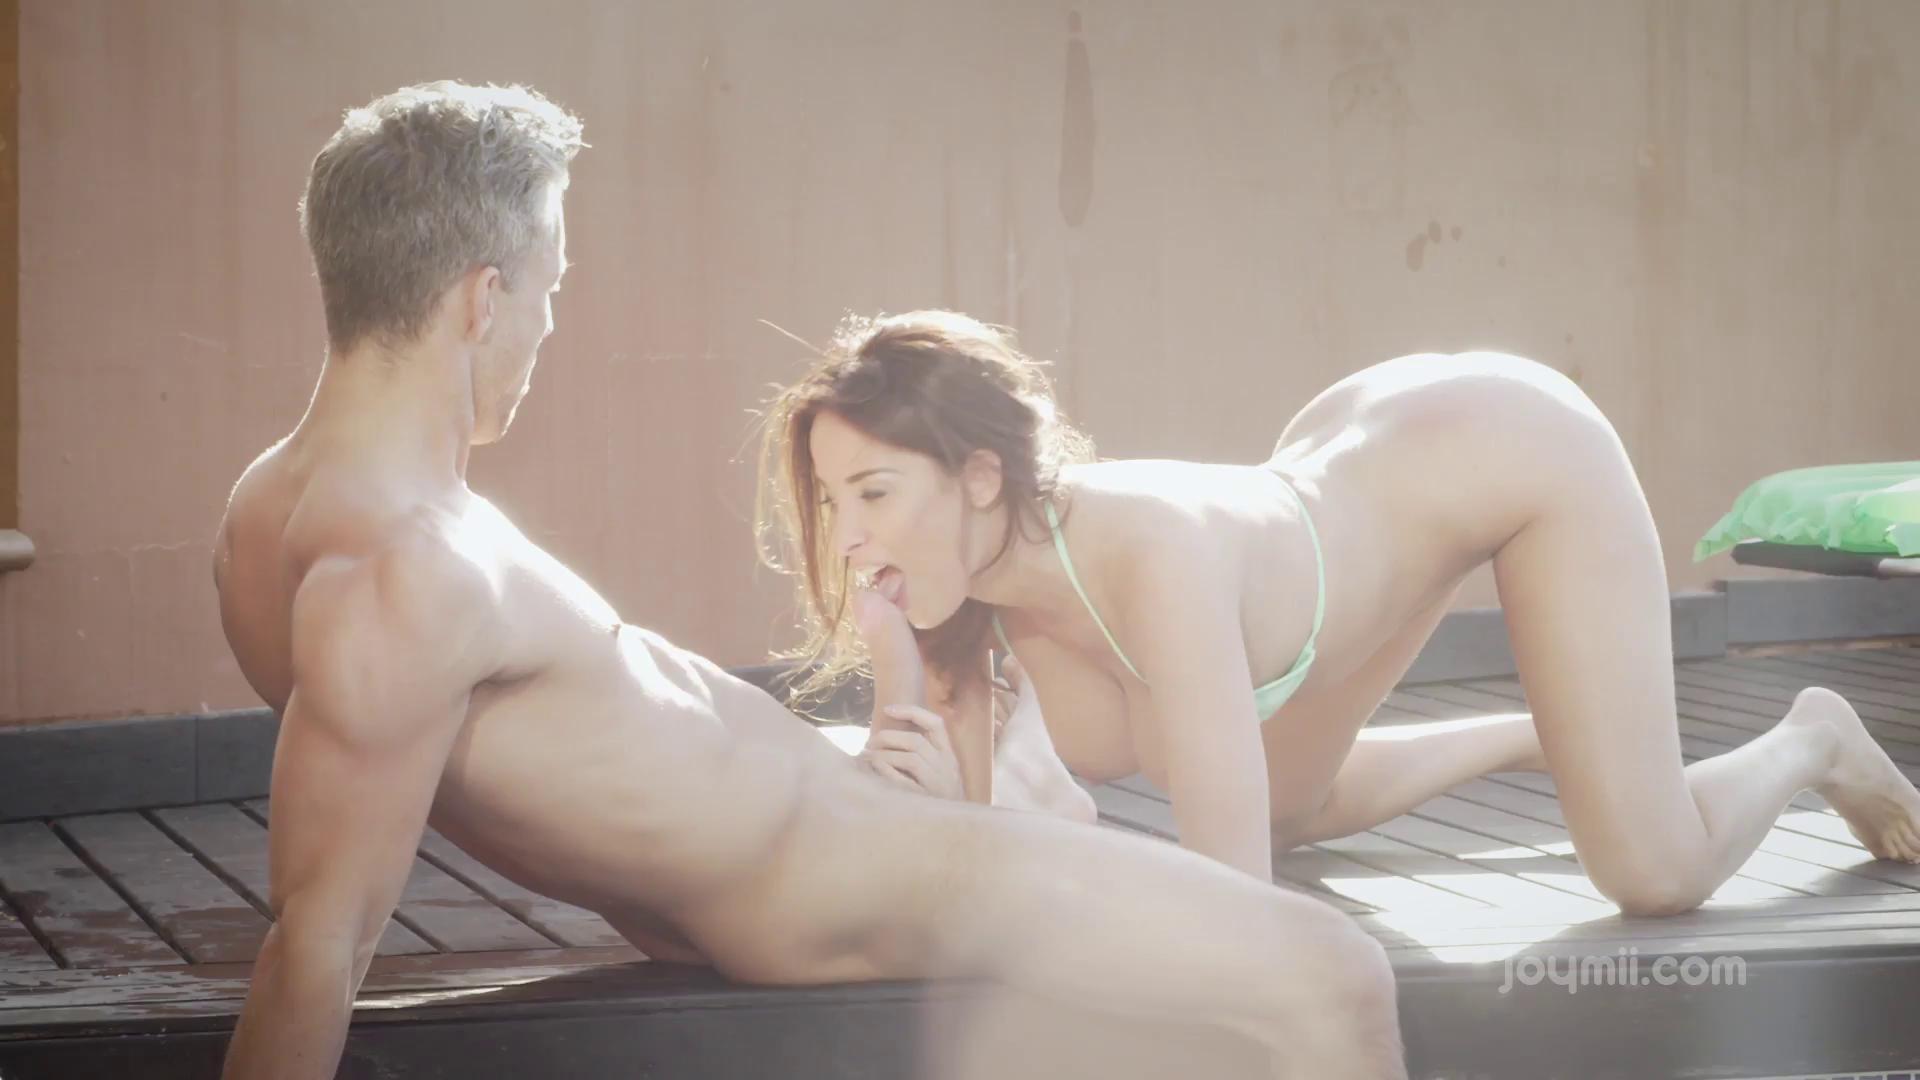 Joymii – Anissa Kate Sex By The Pool